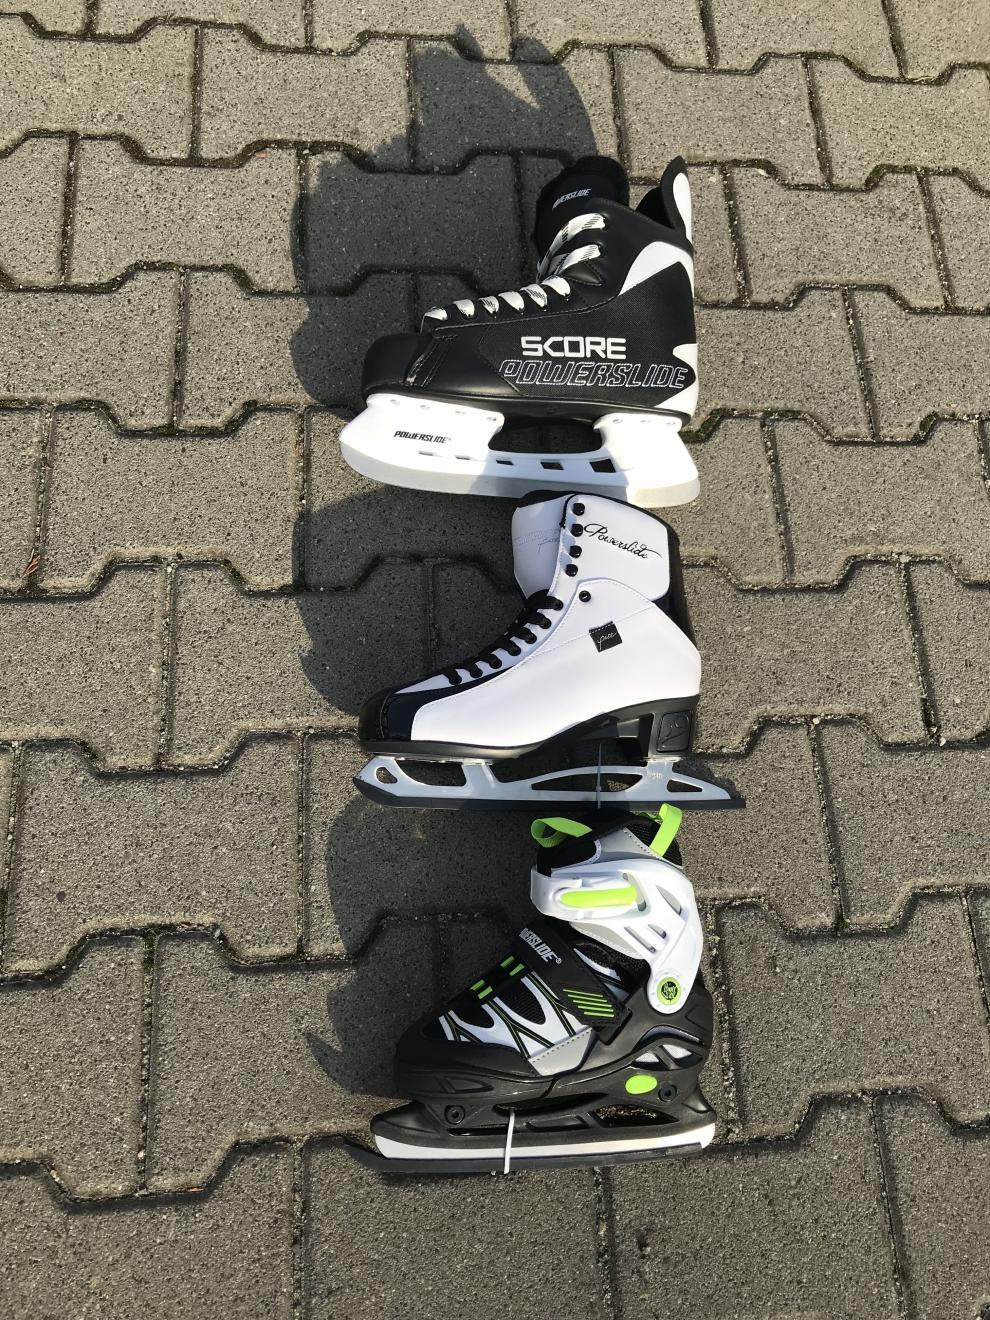 Cheap Ex-Display Ice Skates